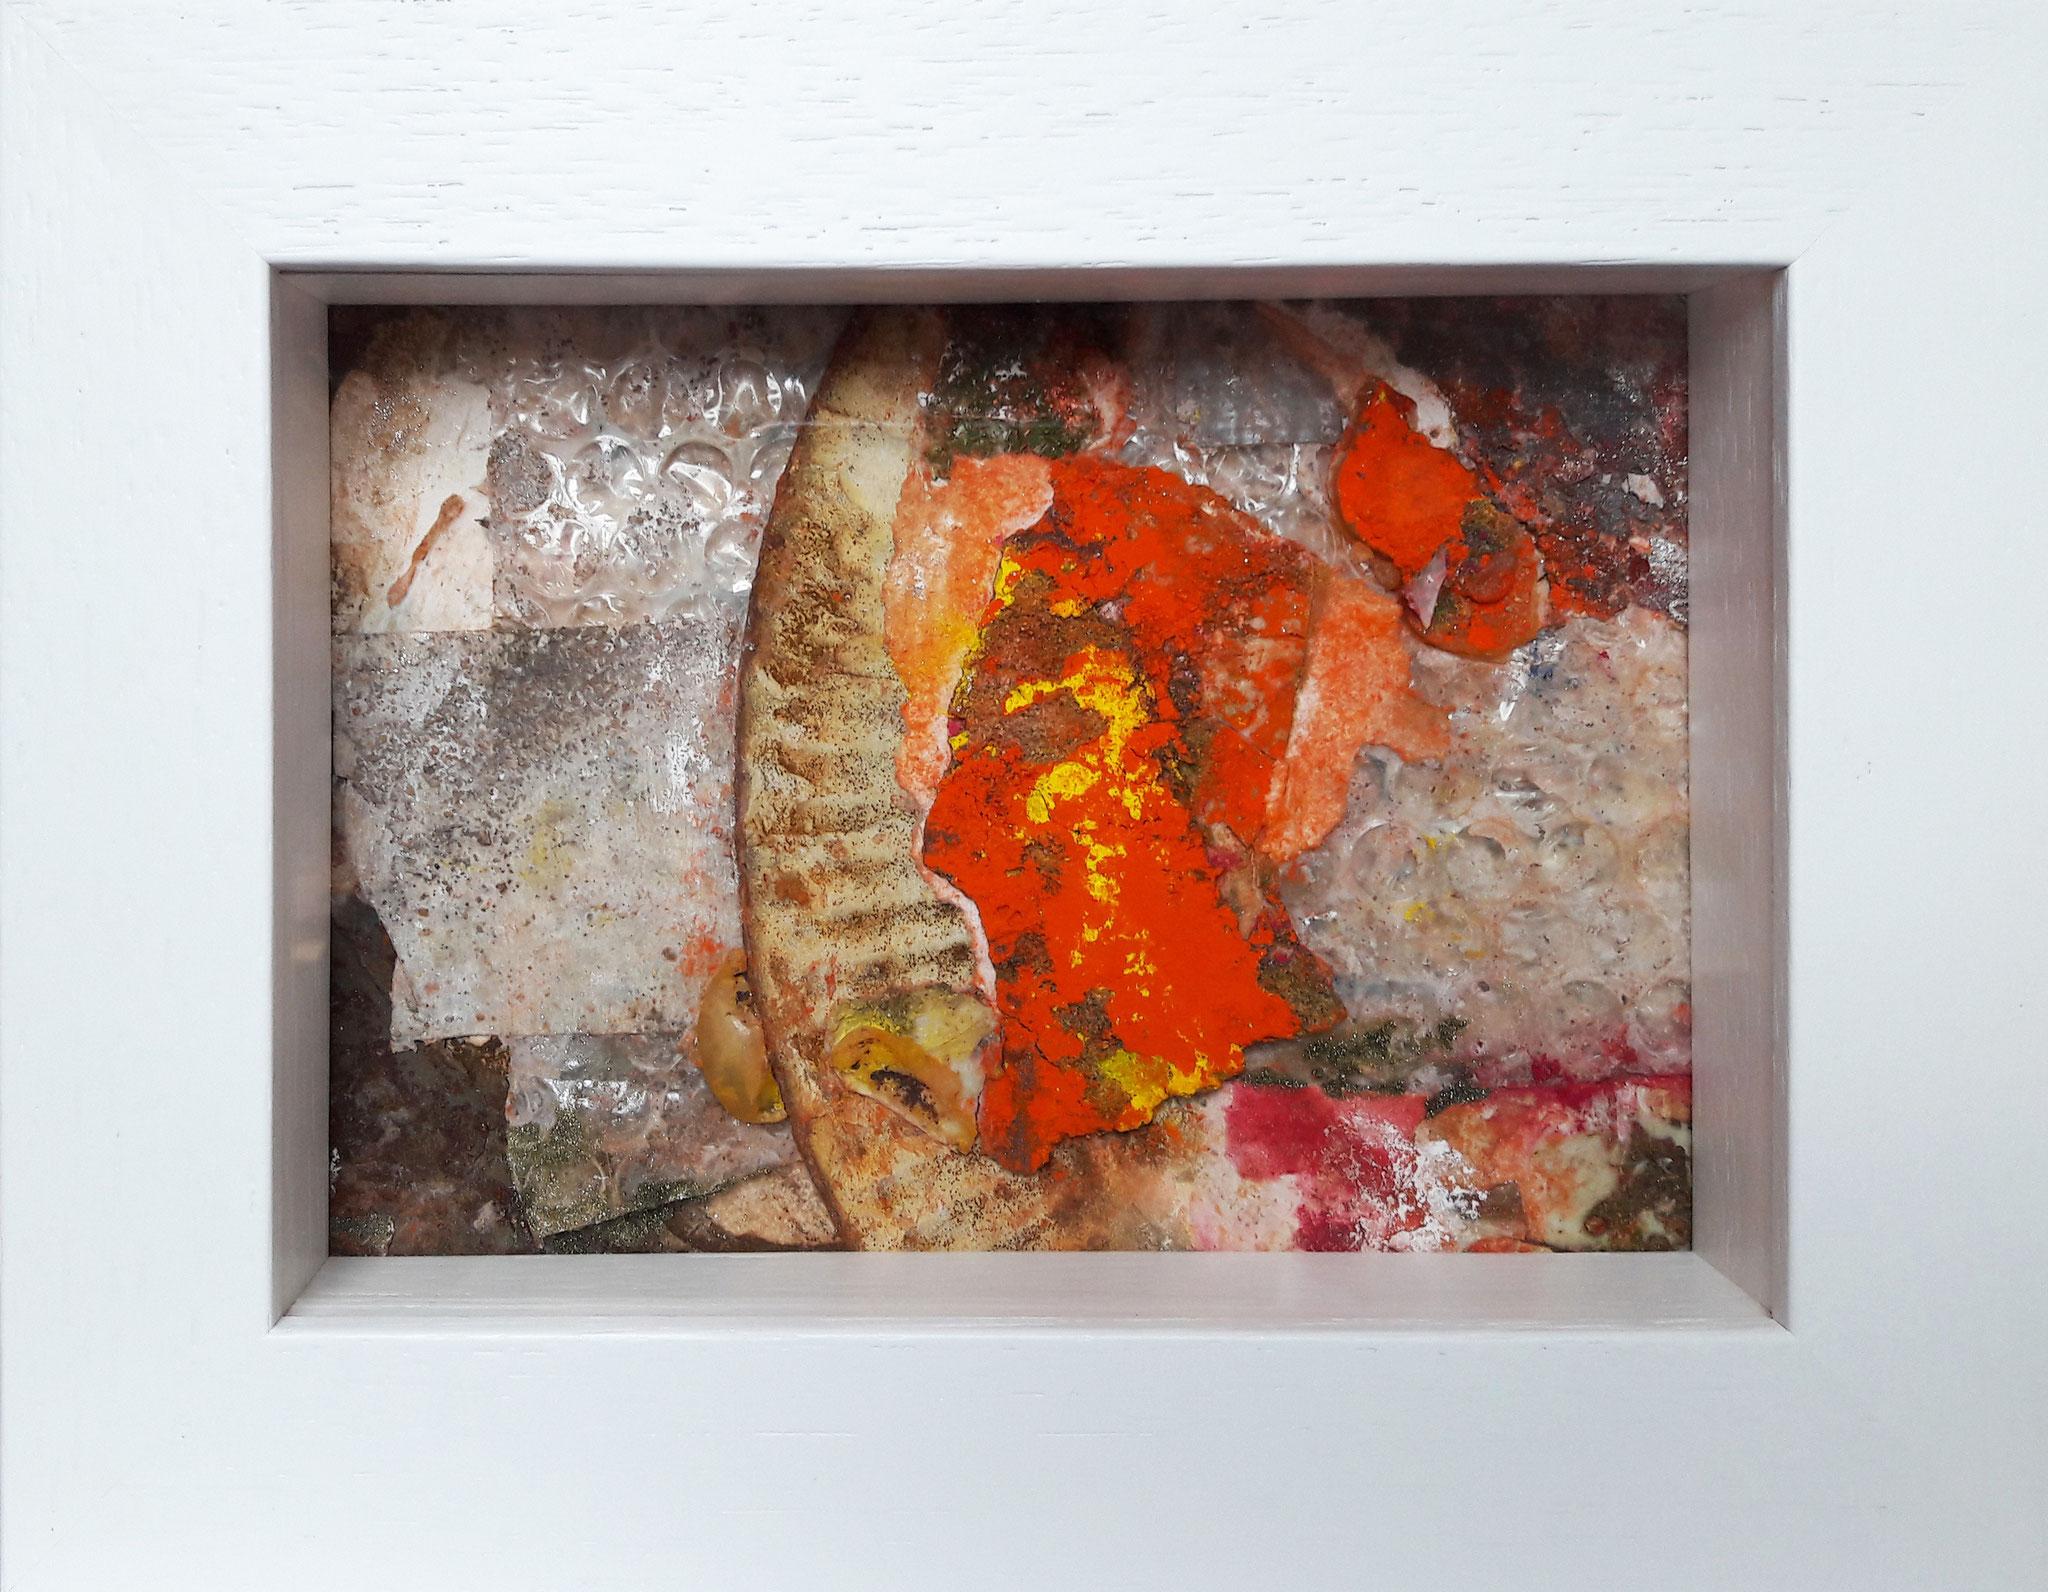 Papperlapapp 4, Acrylmischtechnik, 23 x 18 mit Rahmen, 2017, 140 Euro